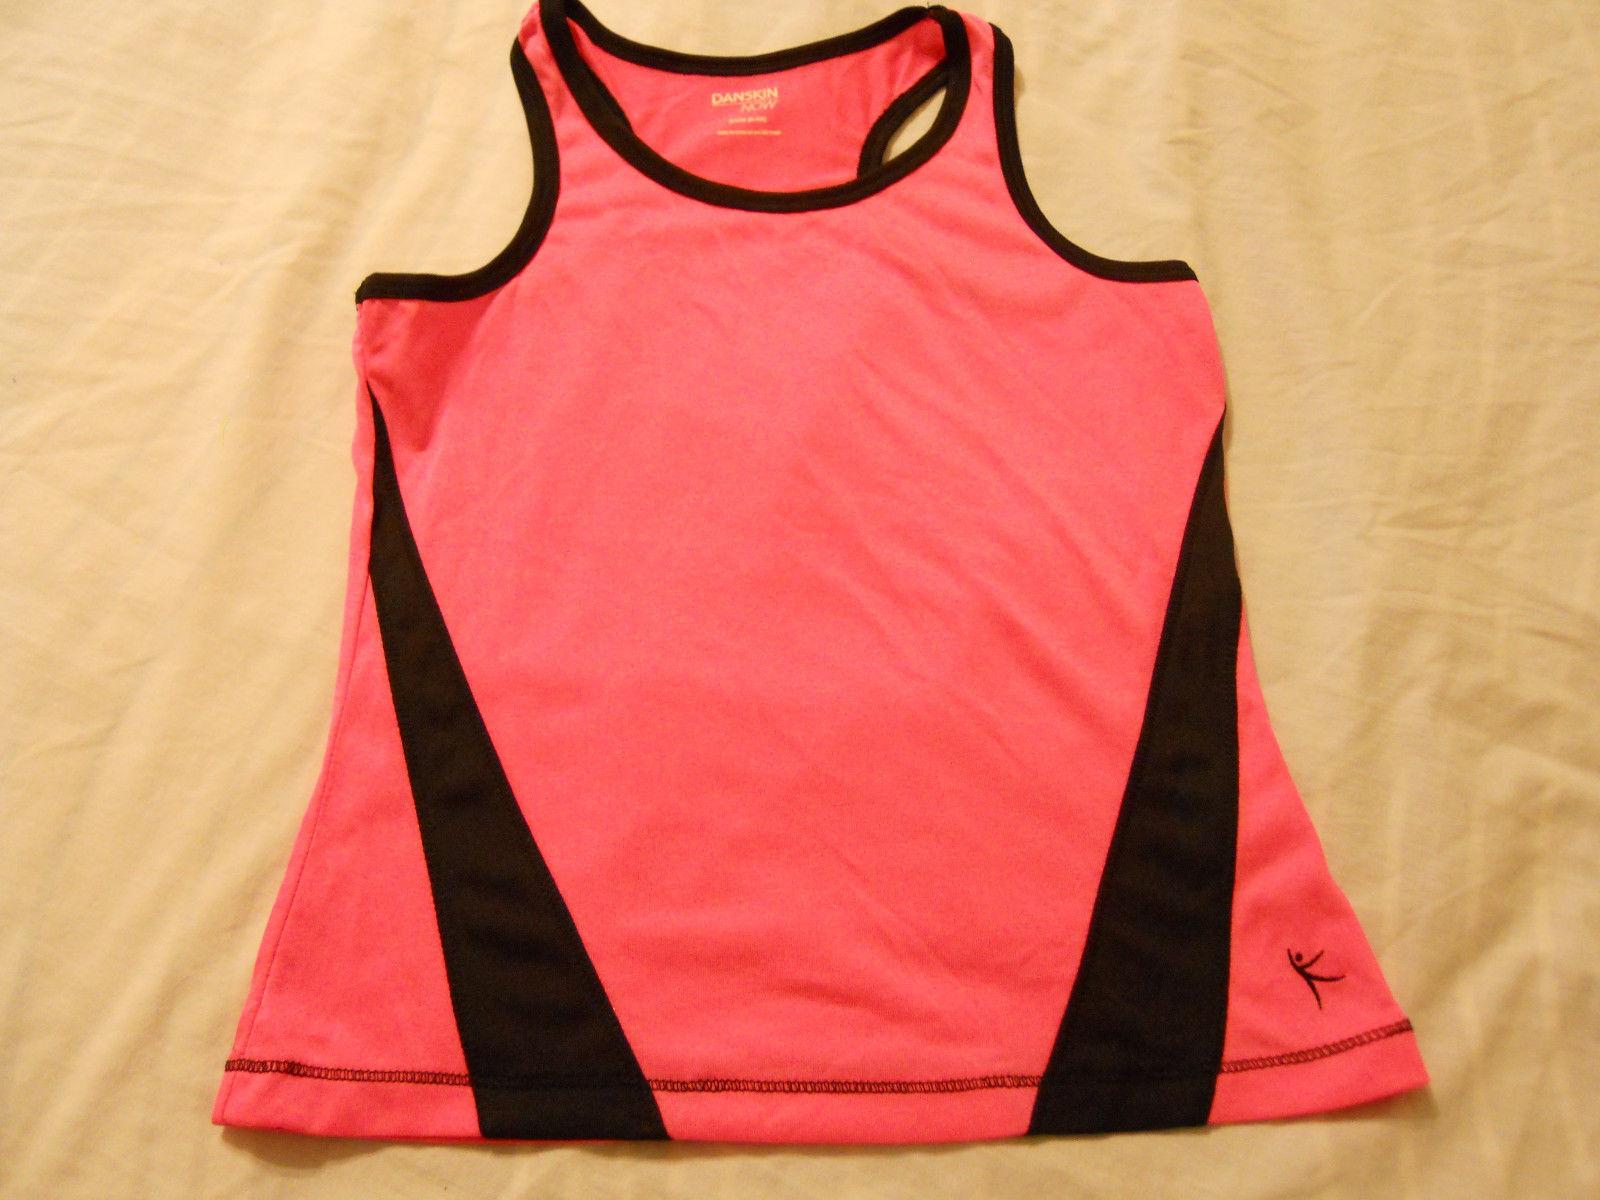 Danskin Now Girls Shirts Poly Tank Top Active Sports Kids Children